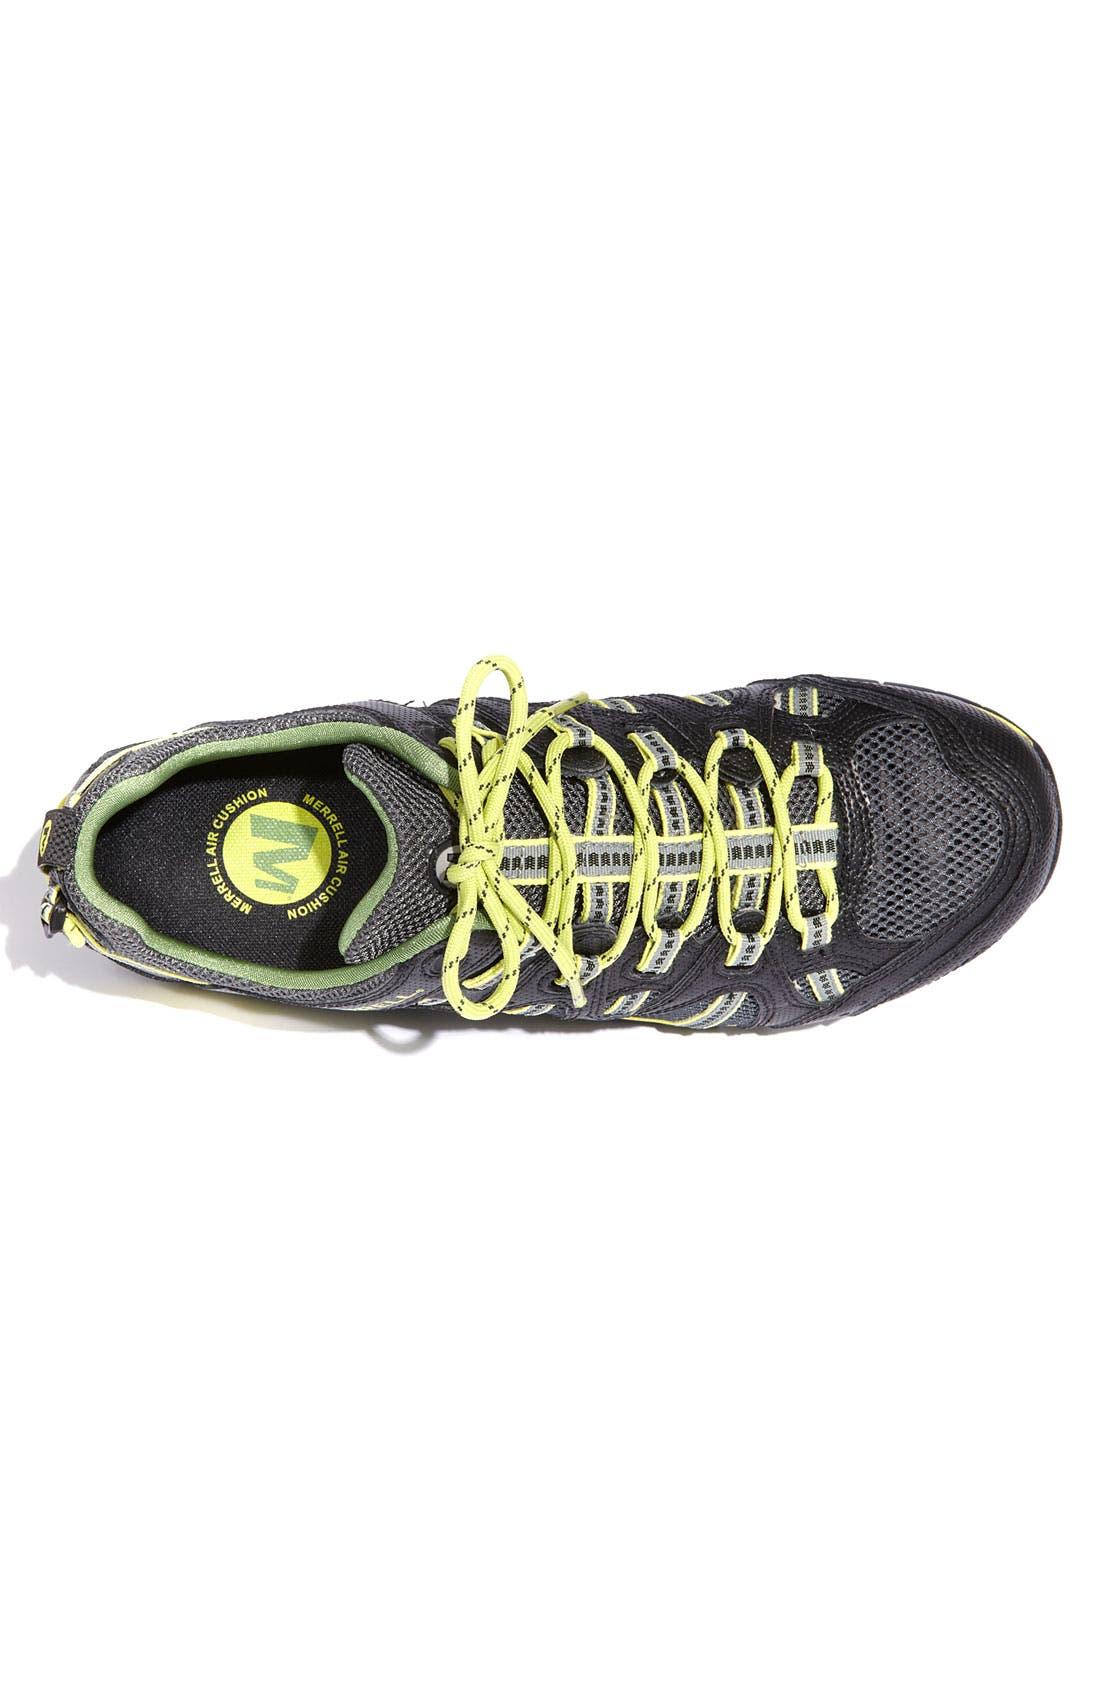 Alternate Image 3  - Merrell 'Waterpro Manistee' Trail Shoe (Men)